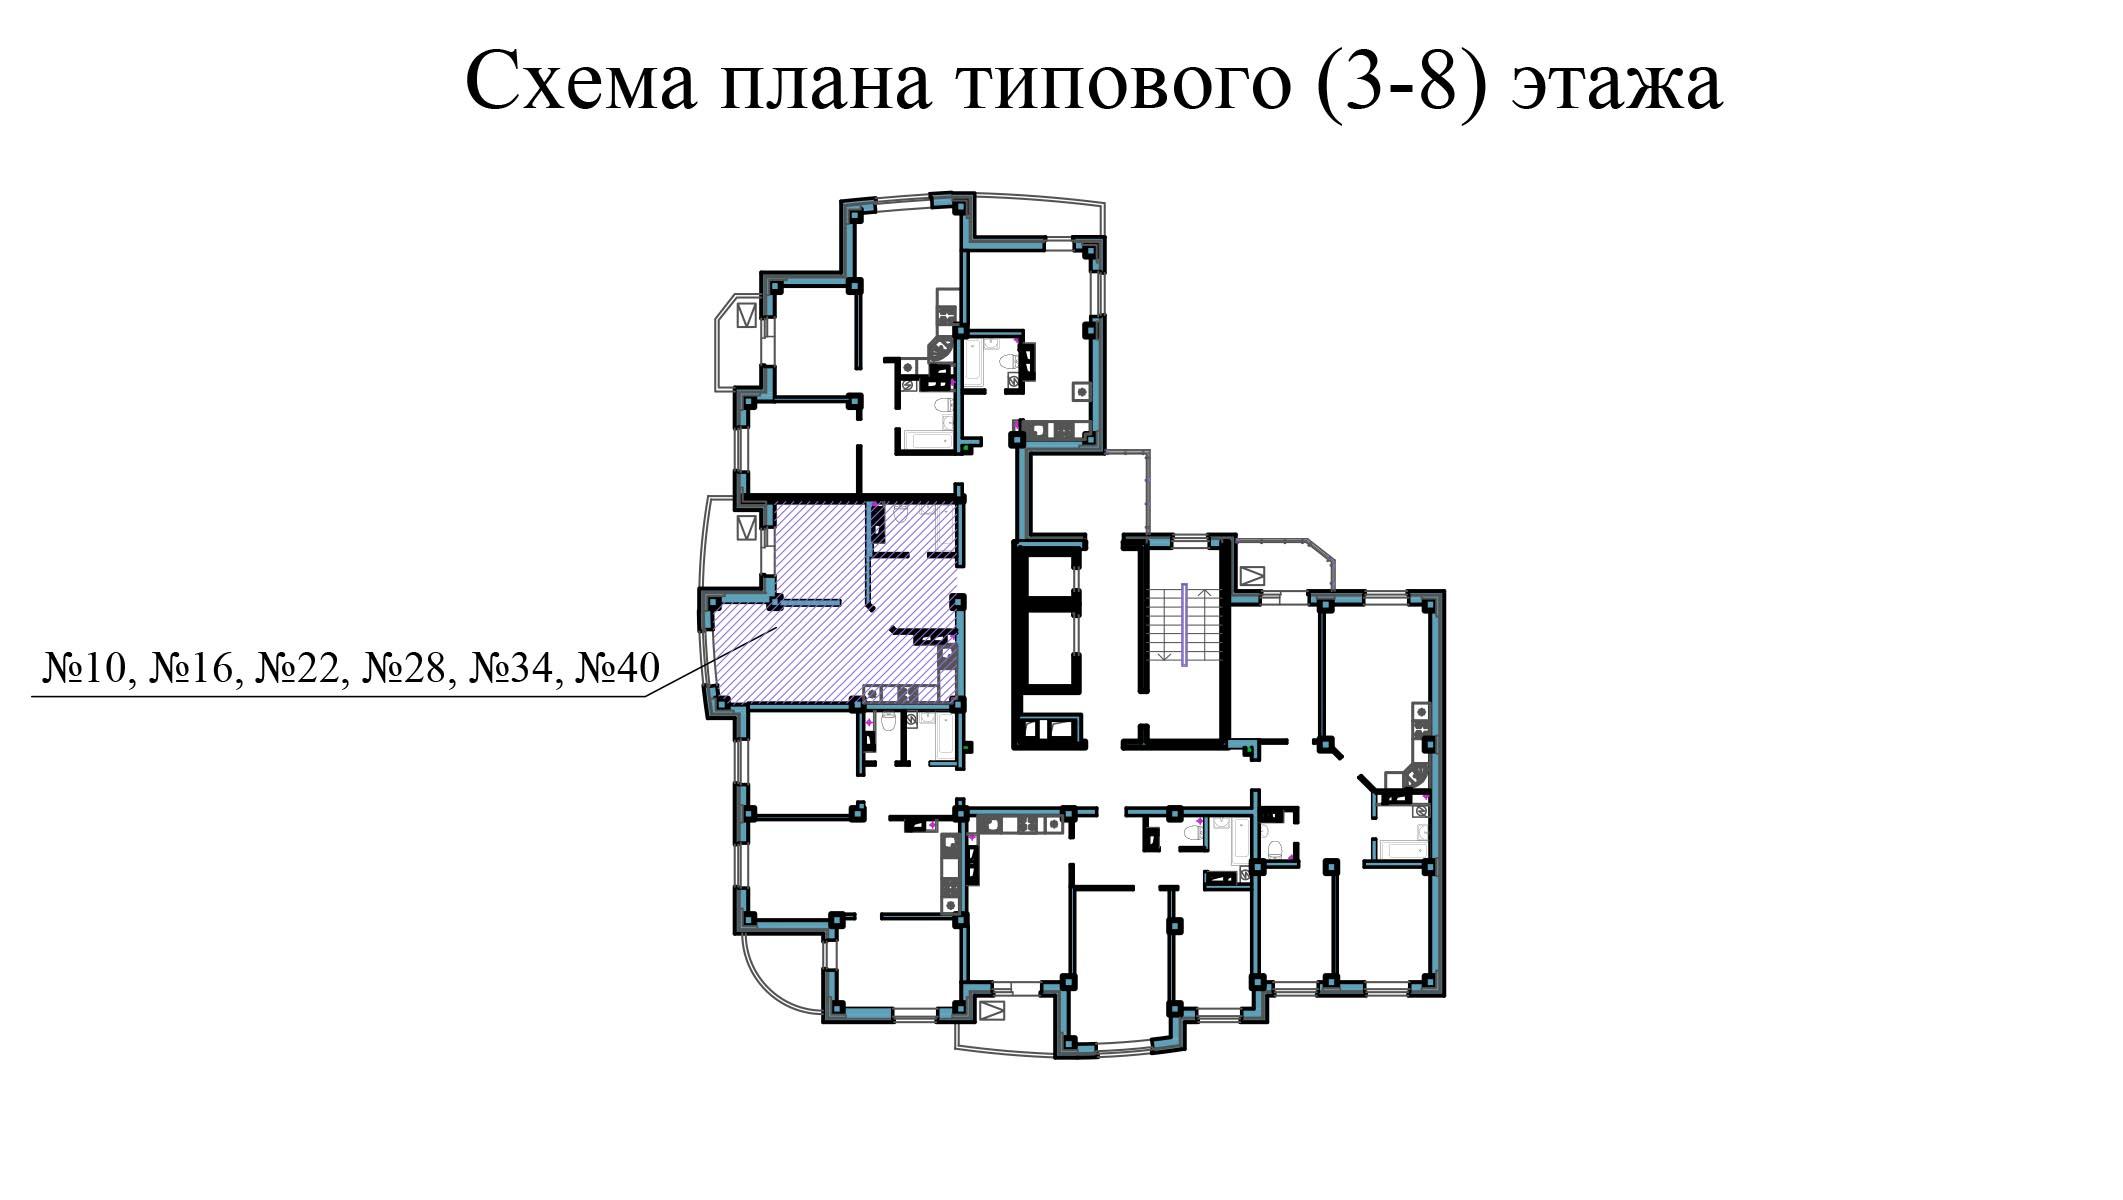 Однокомнатная квартира - ул.Балтийская, д. 1а, кв. 34